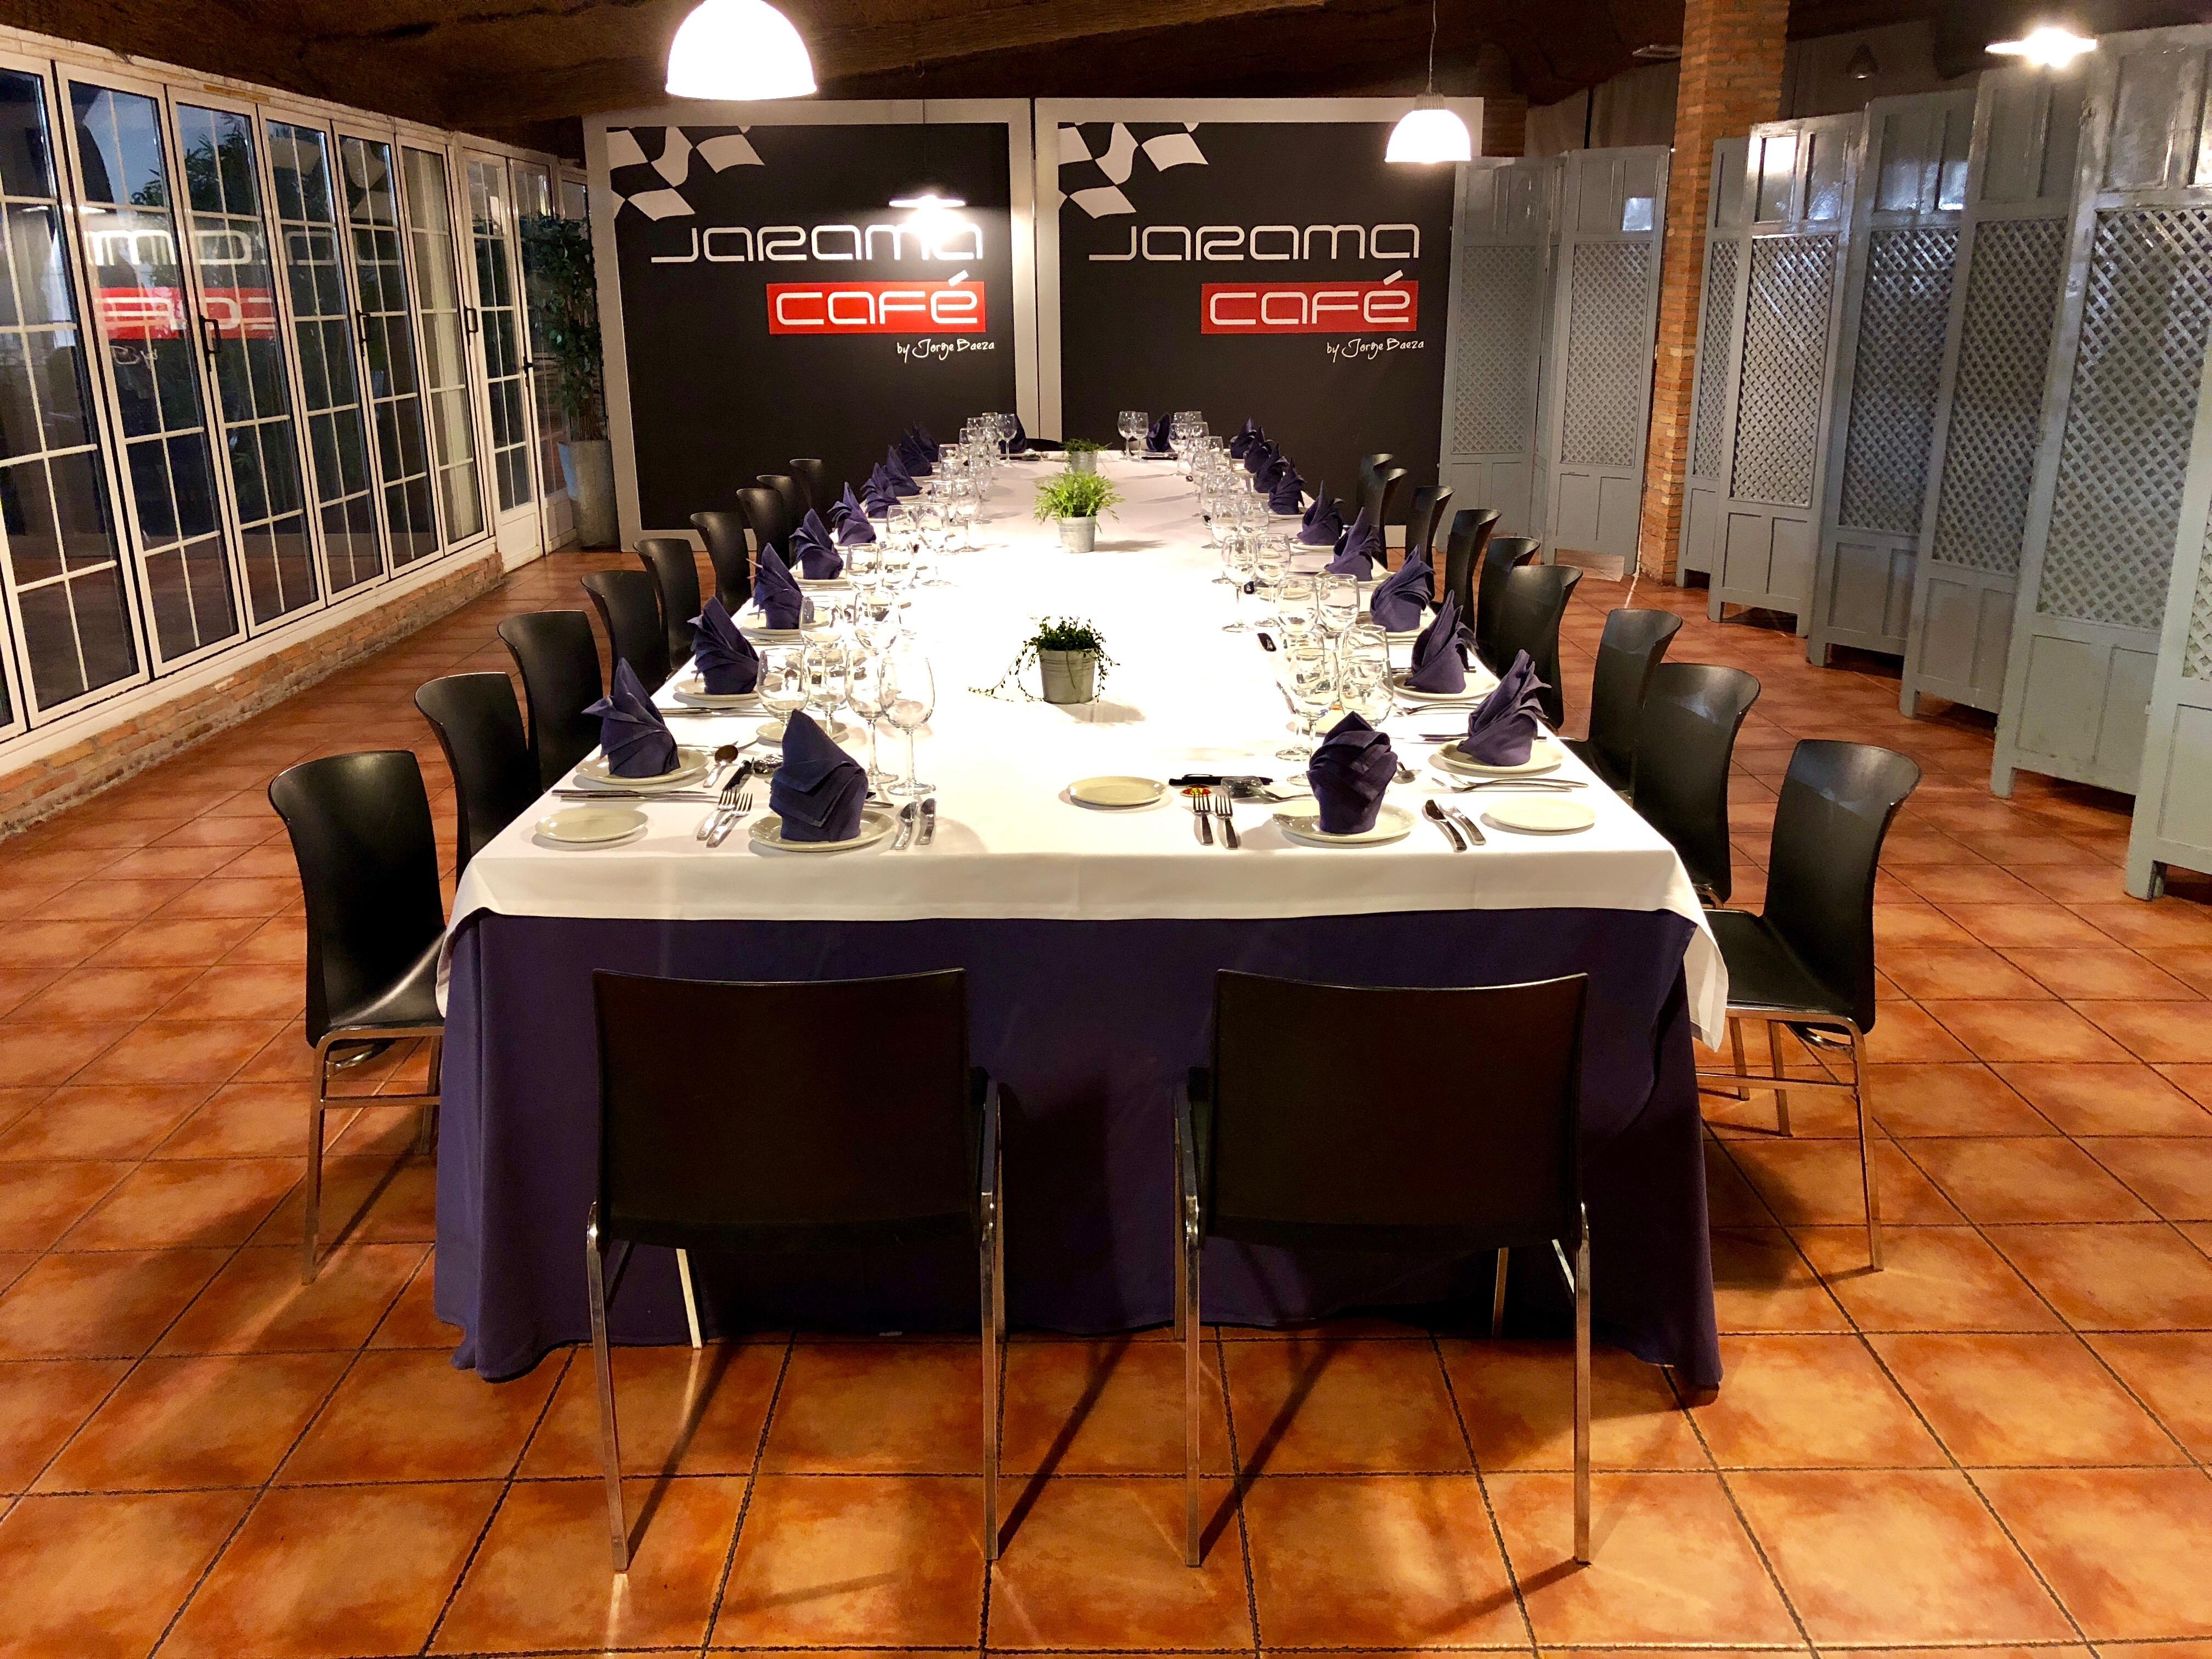 Jarama Café Salón Cristalera Mesa Imperial